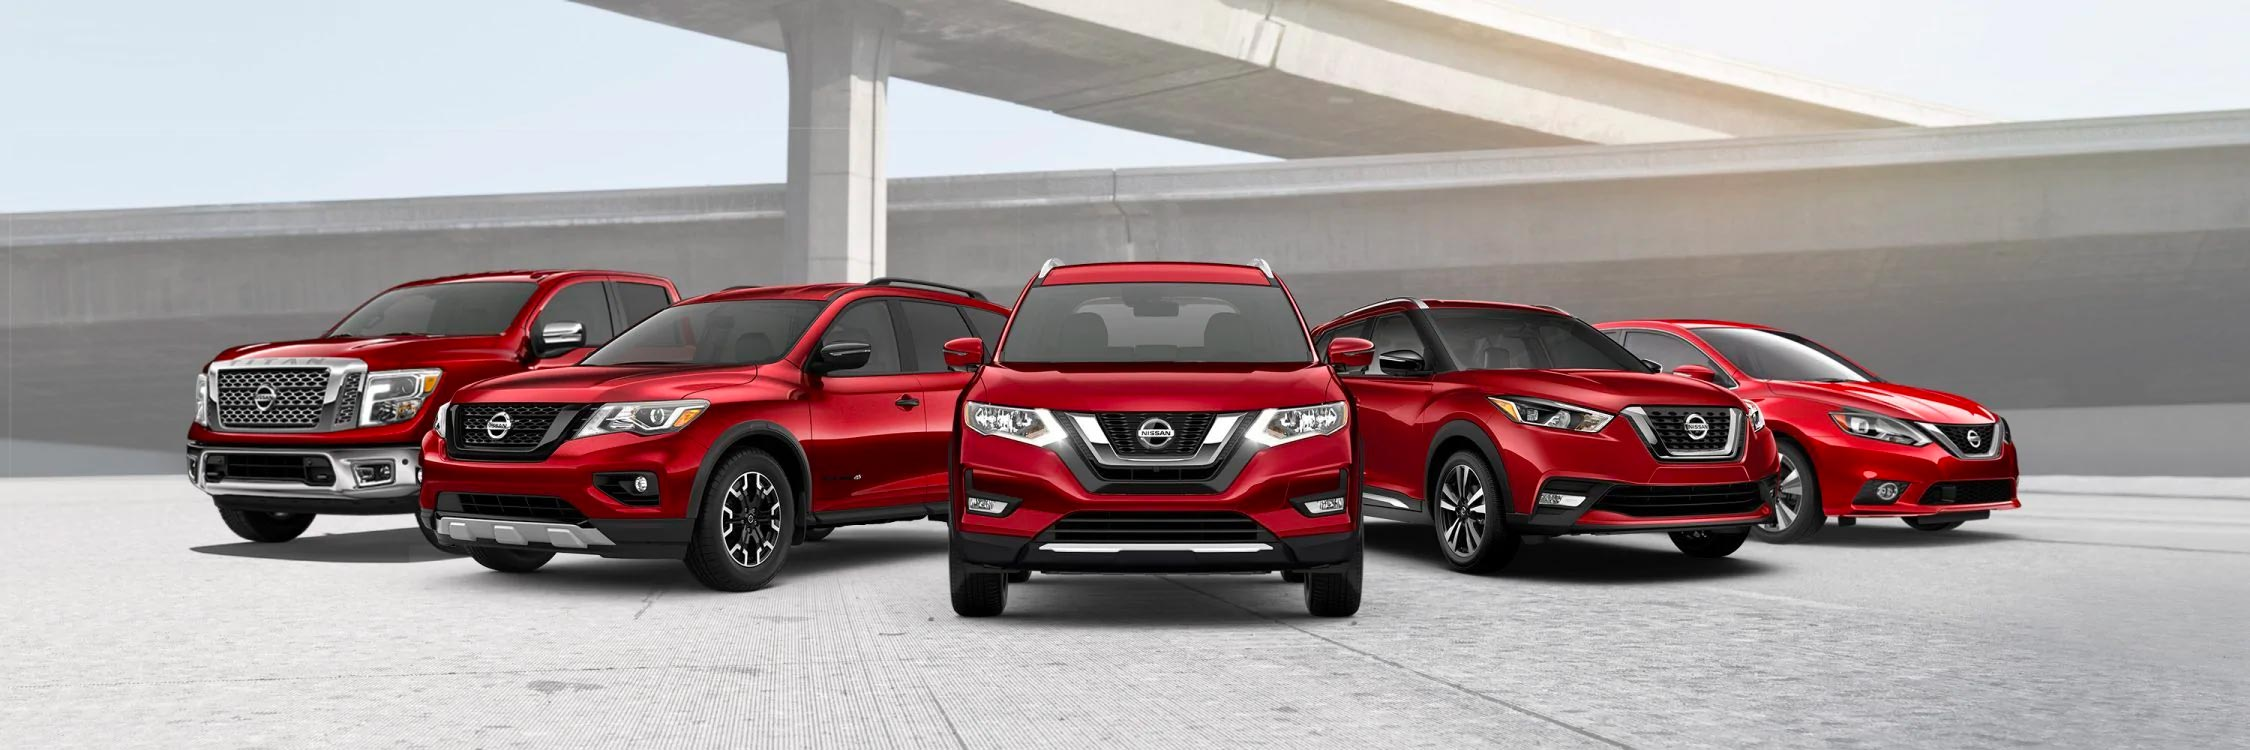 Nissan Rental Car Service for Ann Arbor, MI Drivers